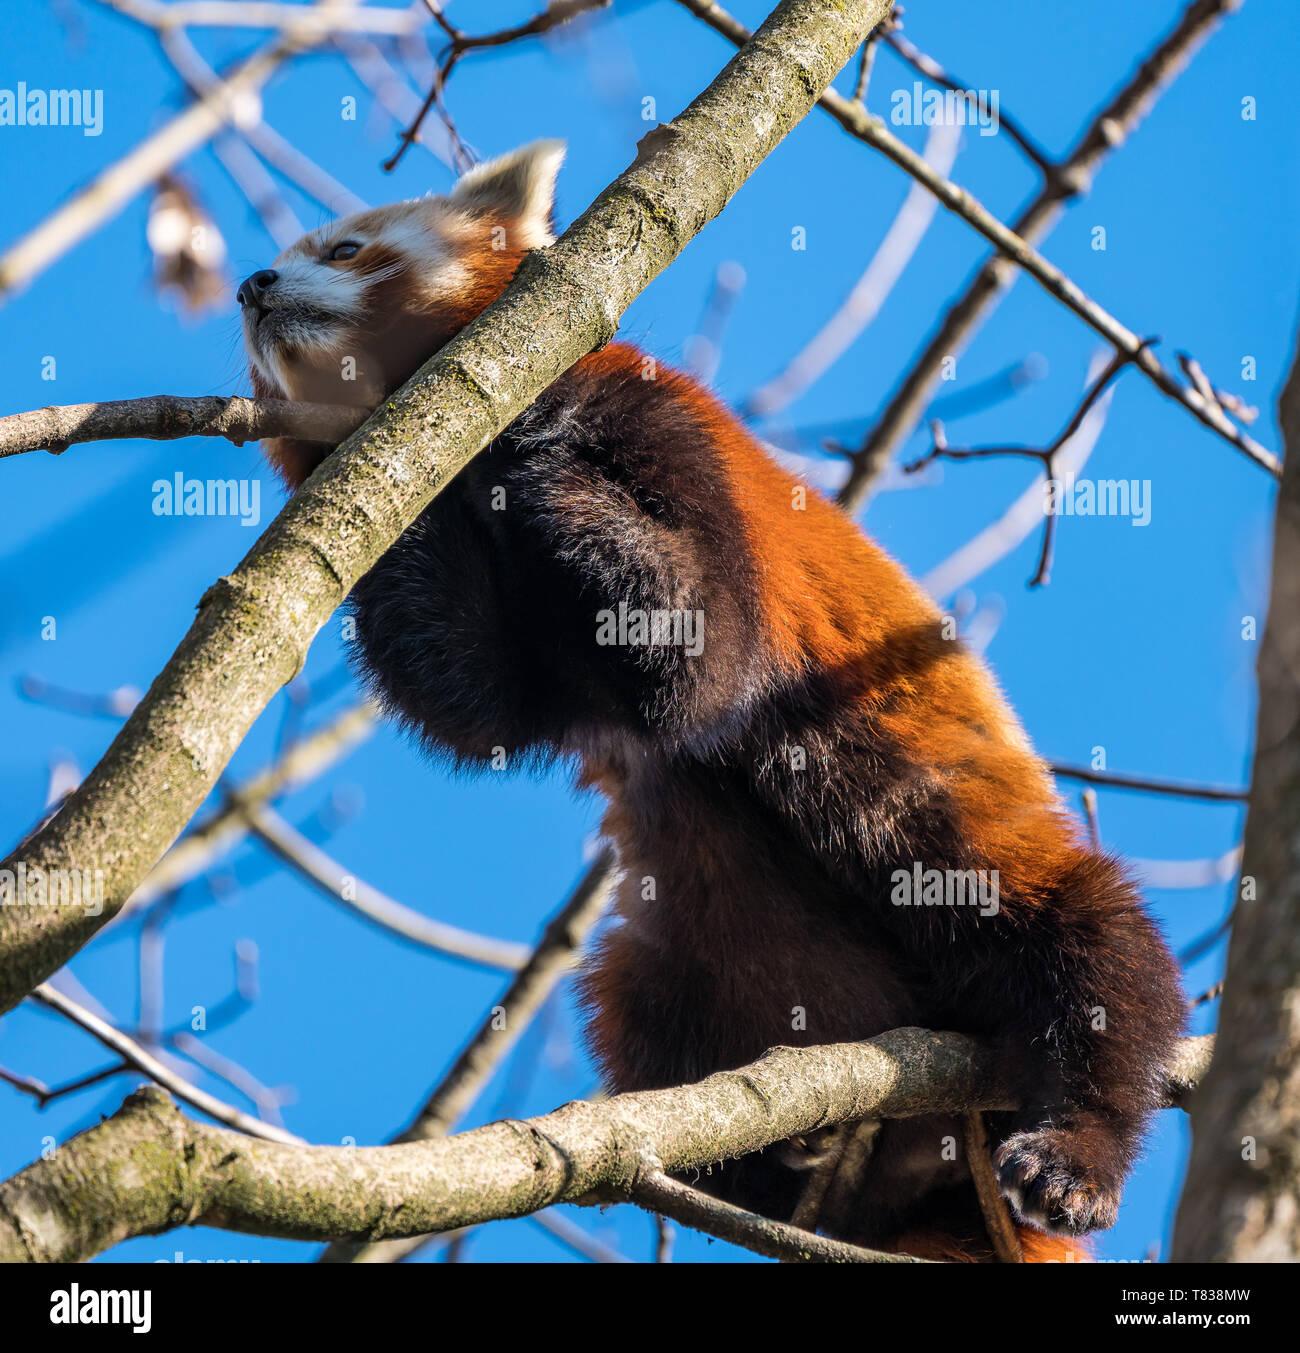 The red panda, Ailurus fulgens, also called the lesser panda. - Stock Image